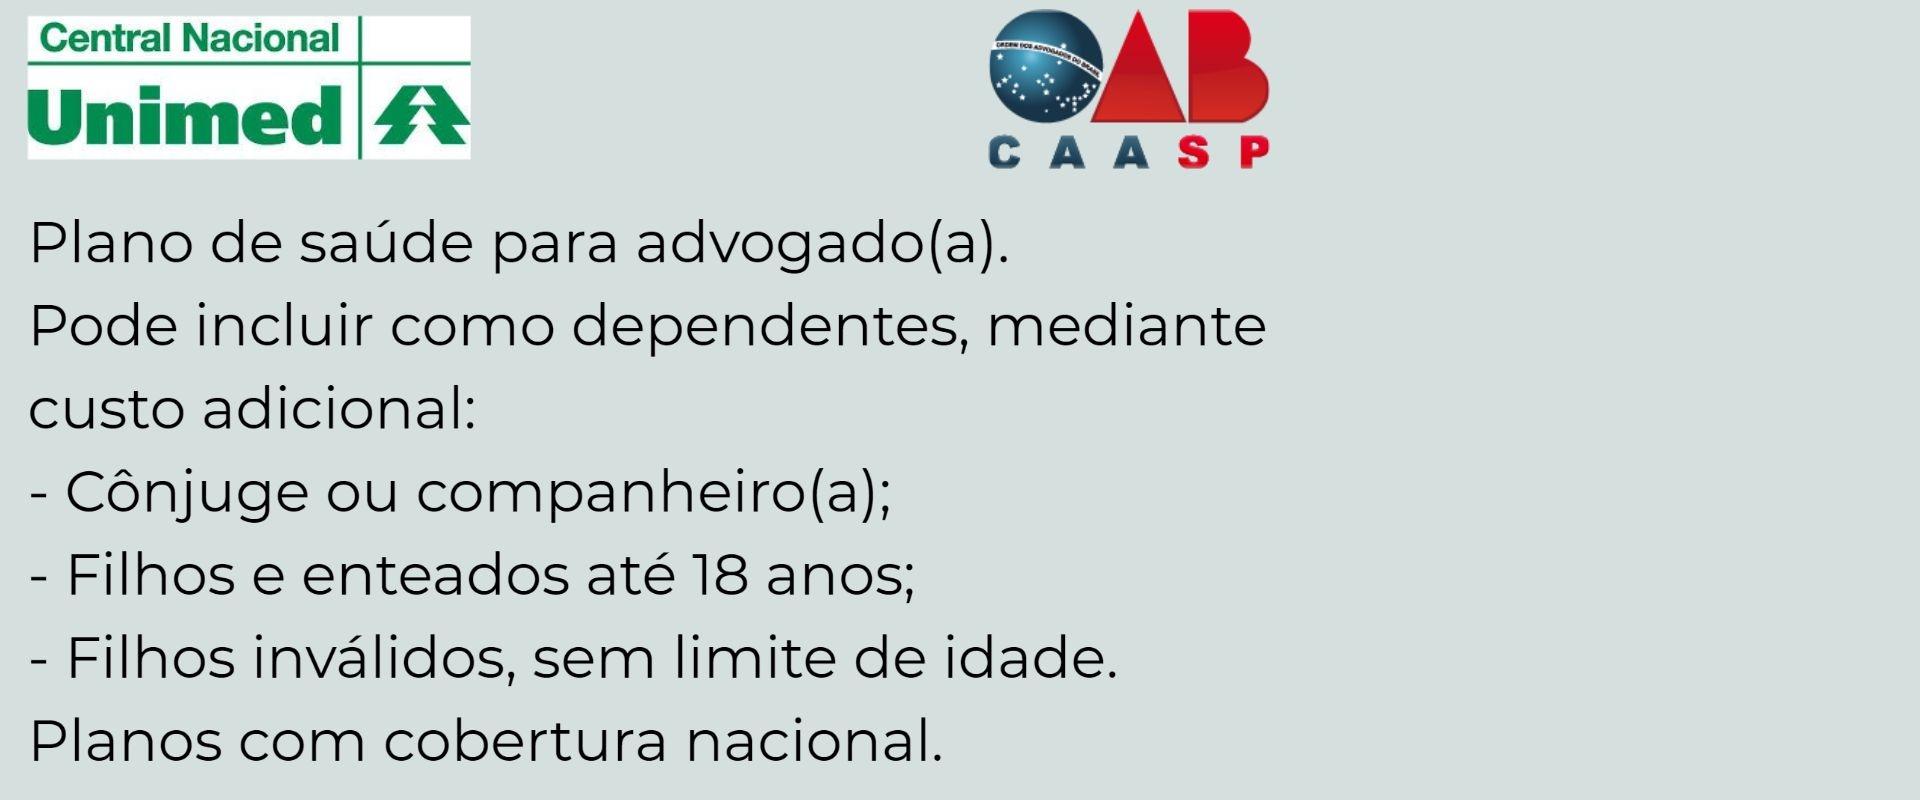 Unimed CAASP Araras